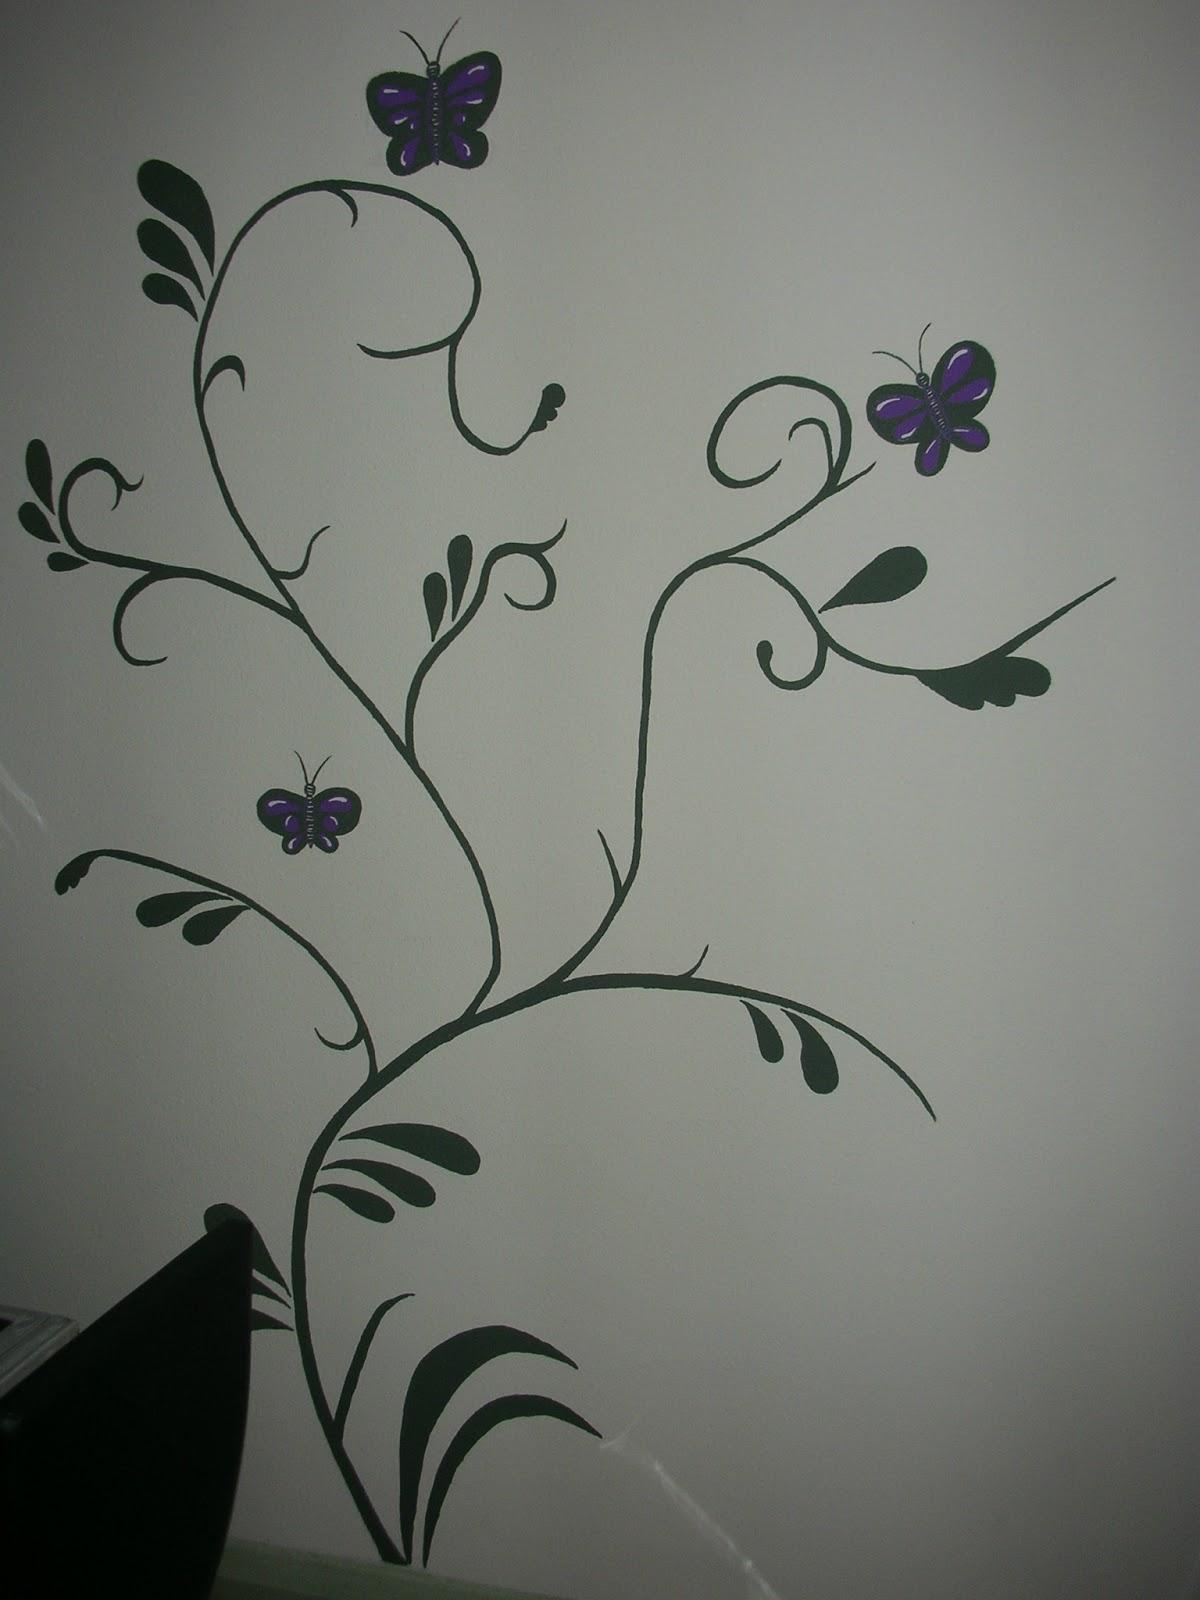 Imagenes de flores para decorar paredes imagenes de flores - Dibujos para paredes ...